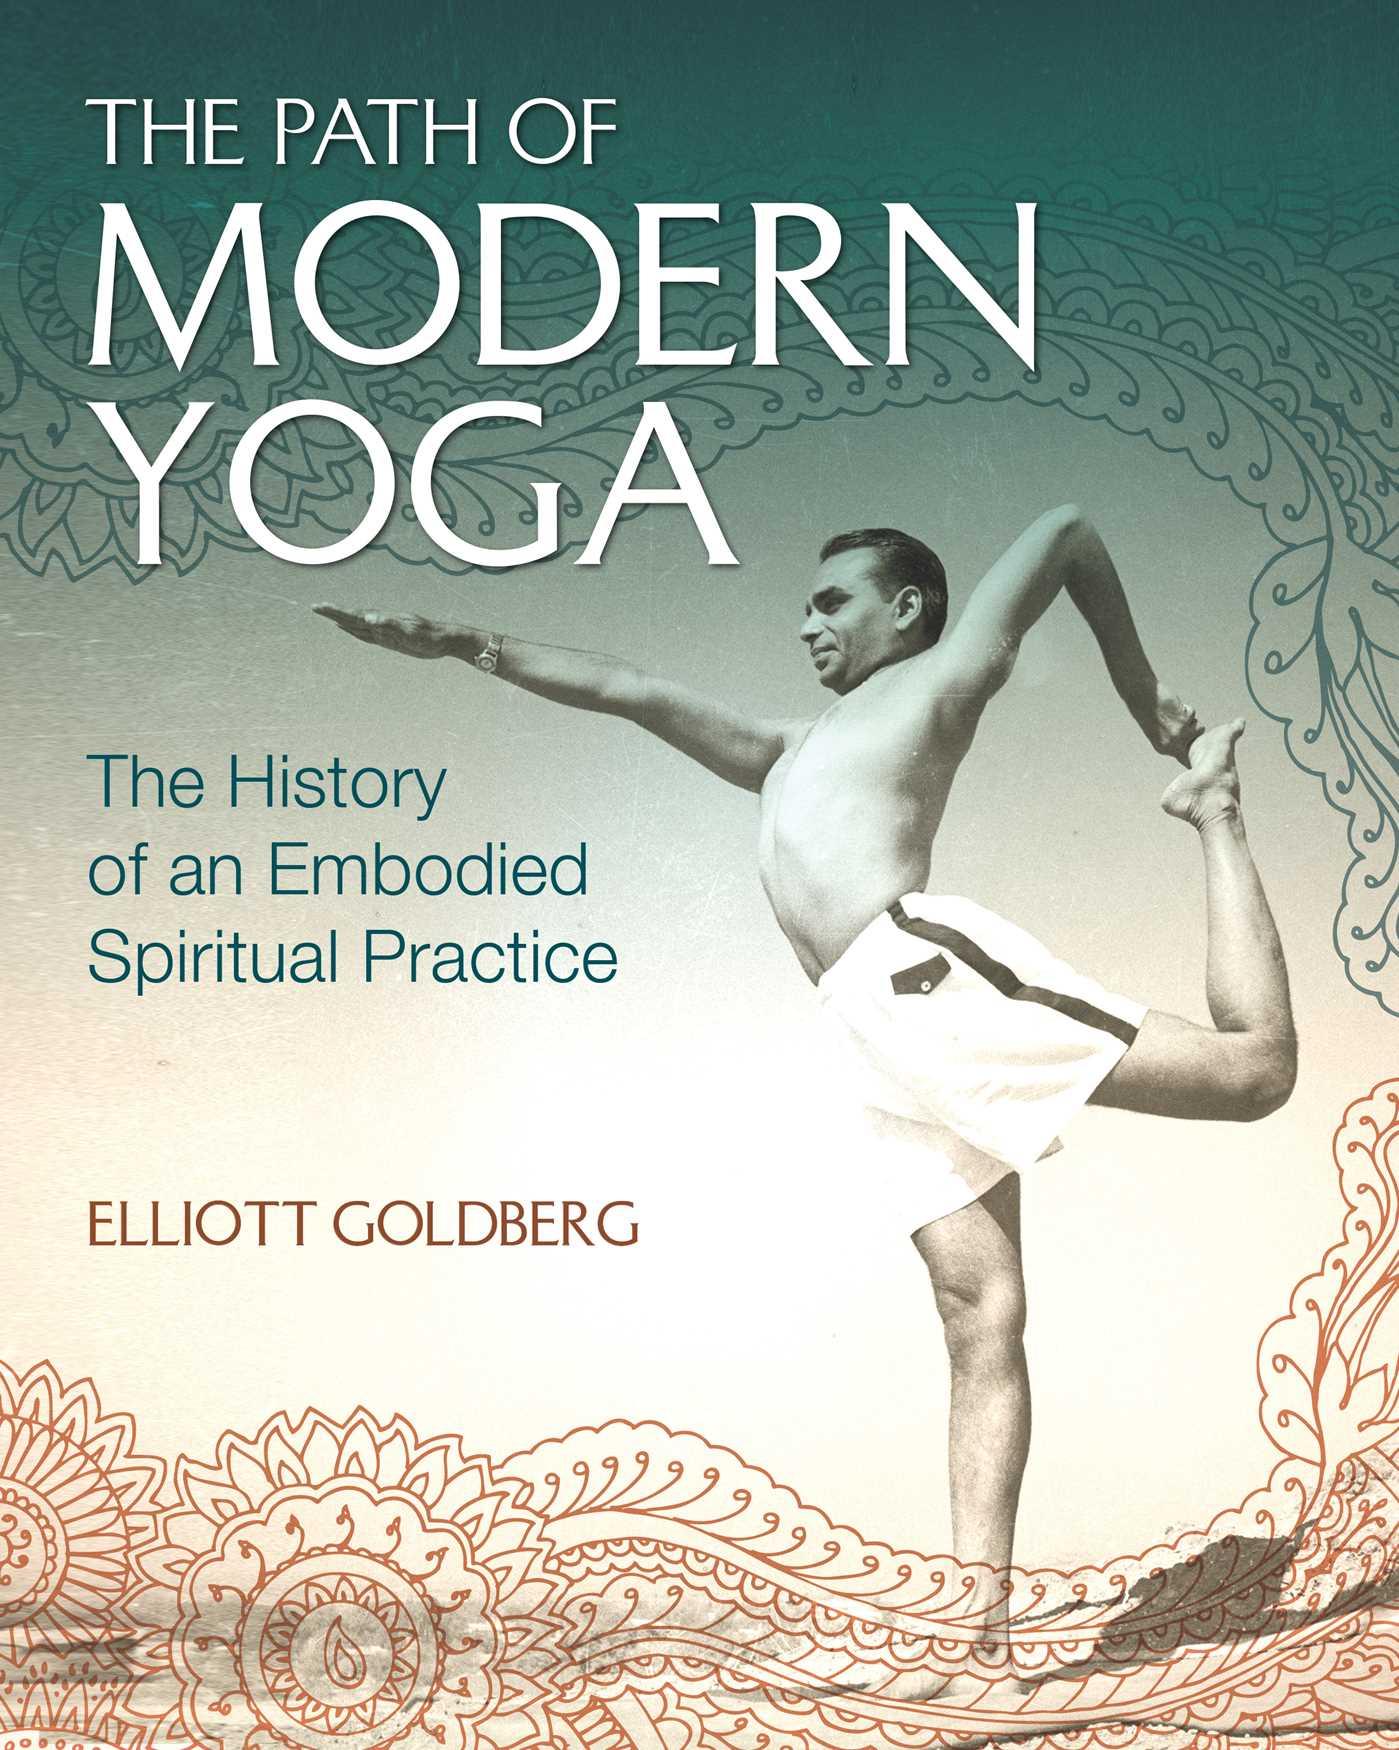 The path of modern yoga 9781620555675 hr